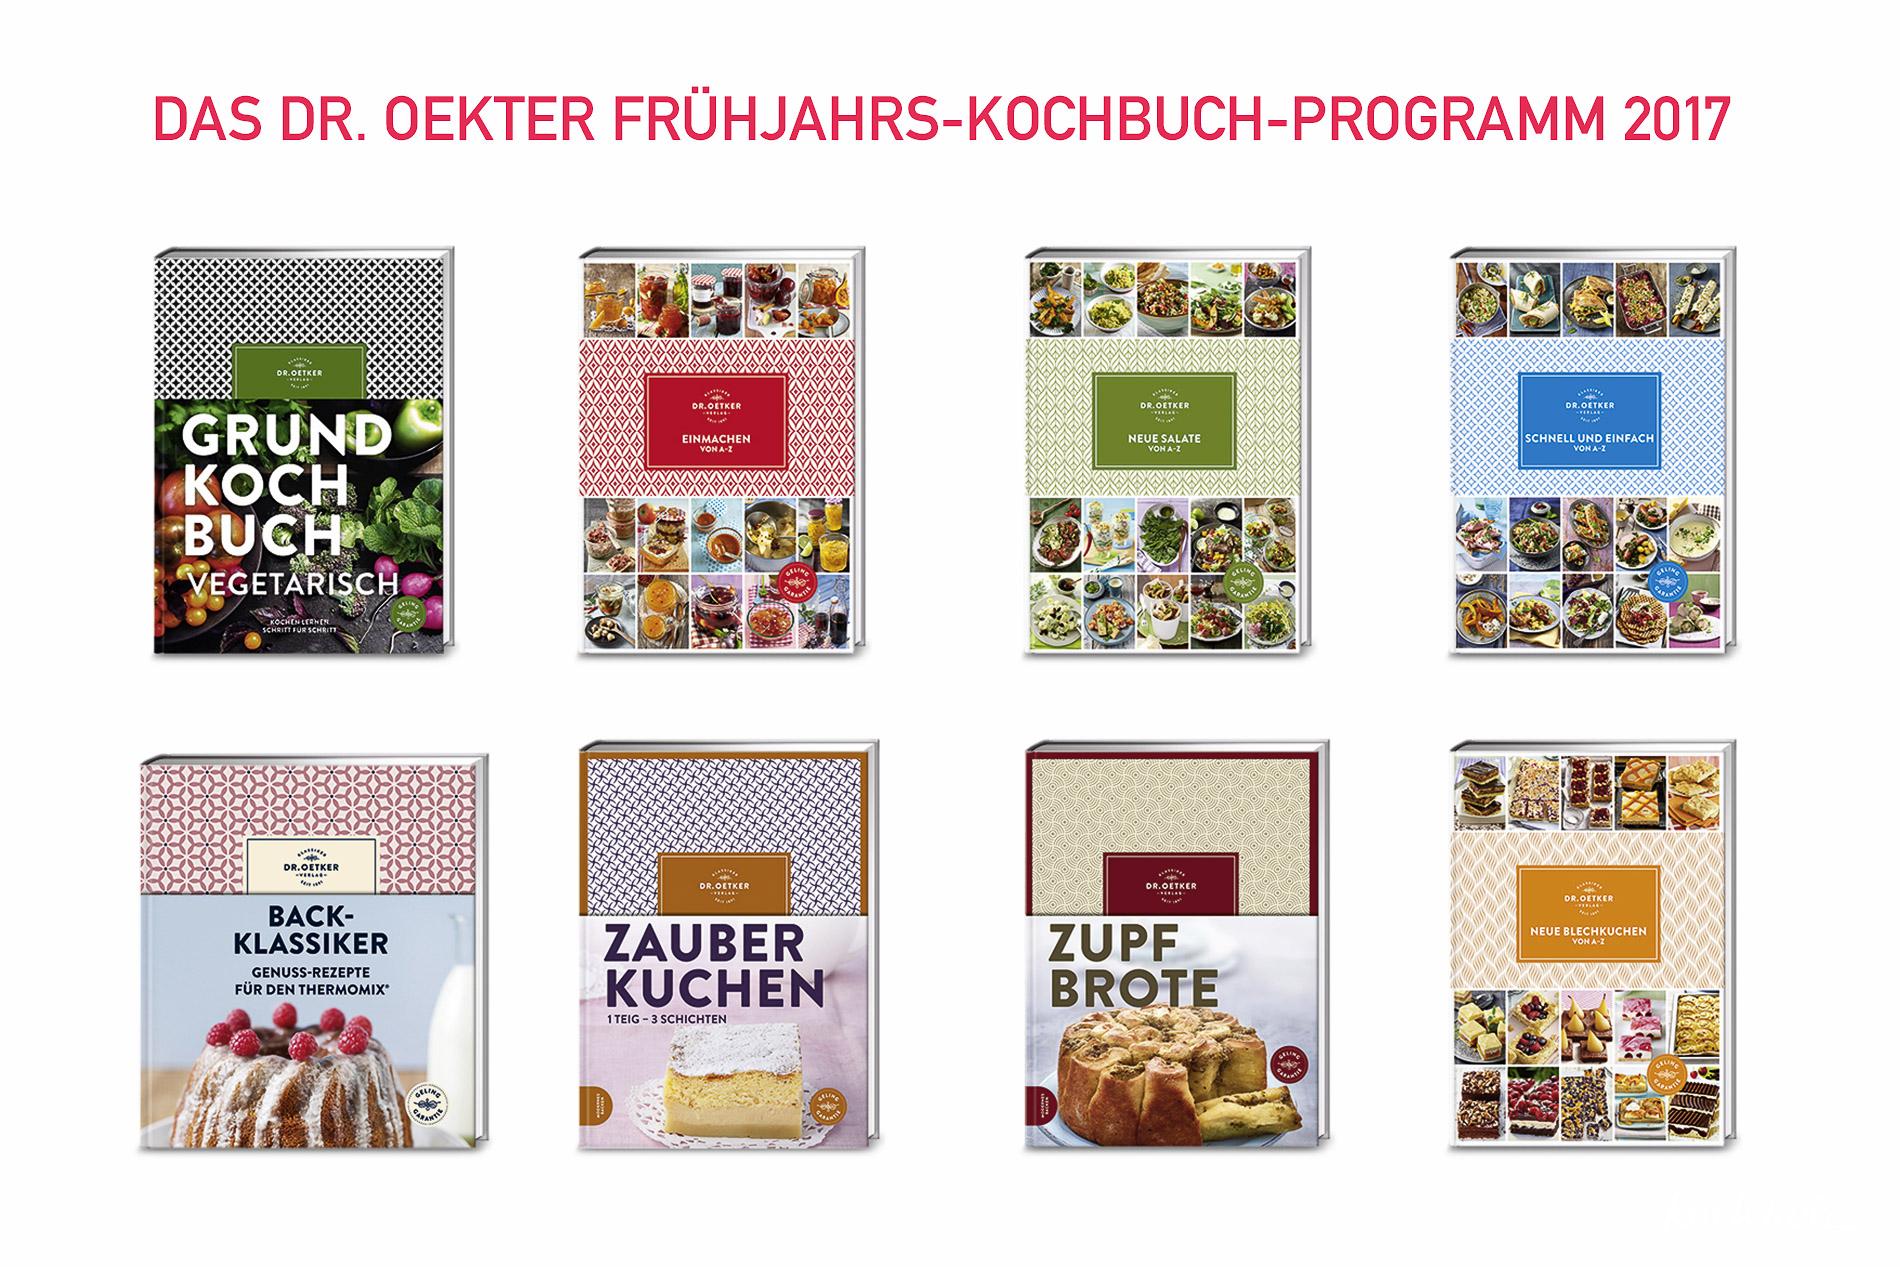 Das Dr. Oetker Frühjahrs-Kochbuch-Programm 2017 – ich bin sehr positiv angetan